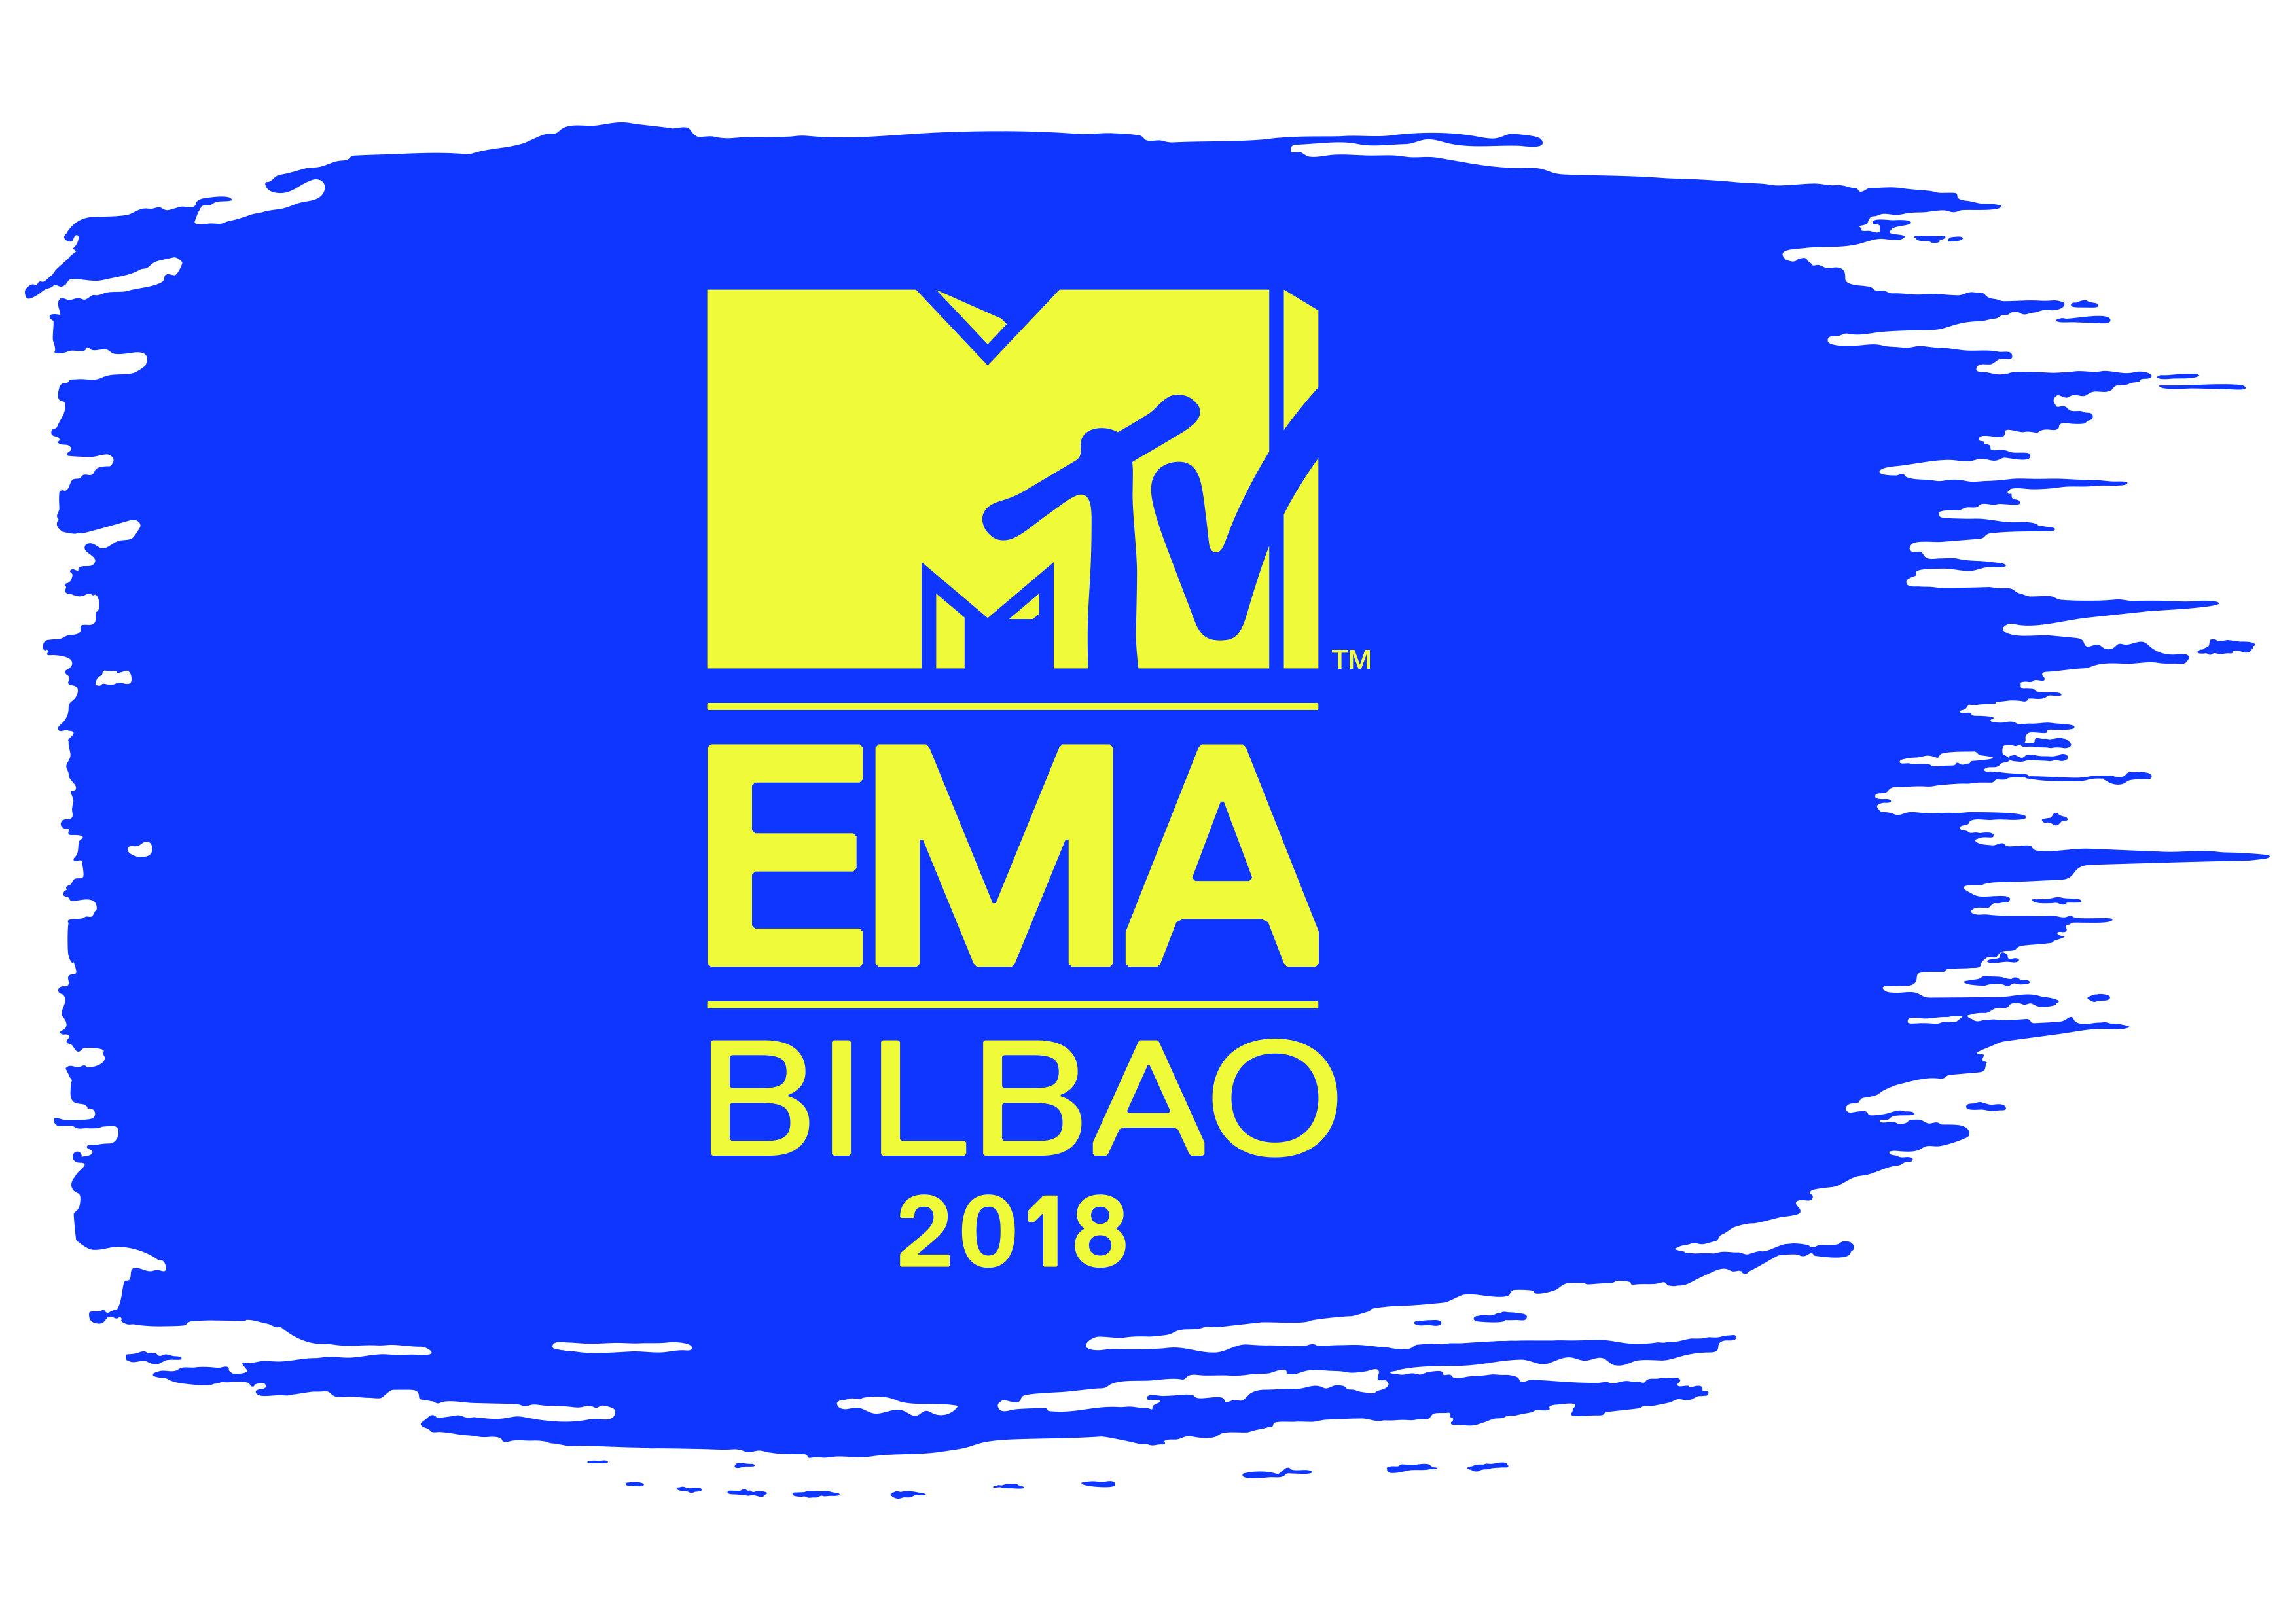 2018 MTV Europe Music Awards - Wikipedia